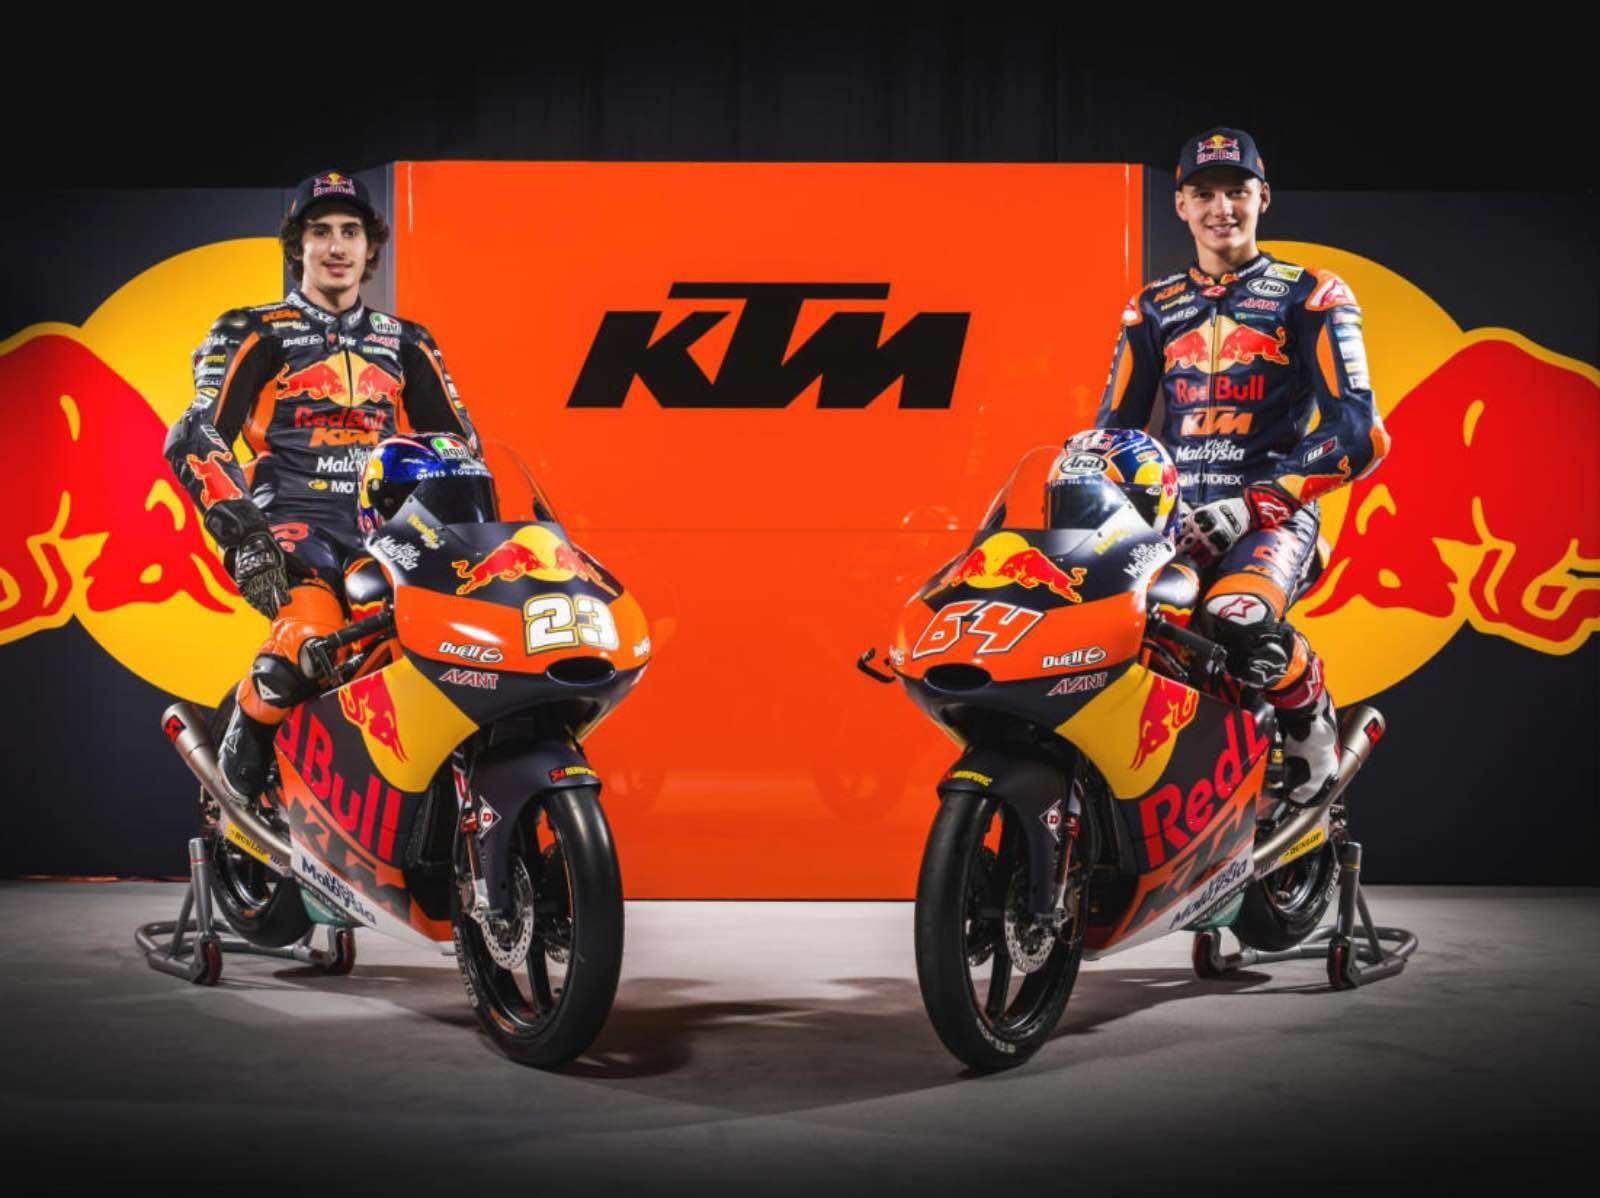 Nace una nueva bestia: KTM RC16 MotoGP